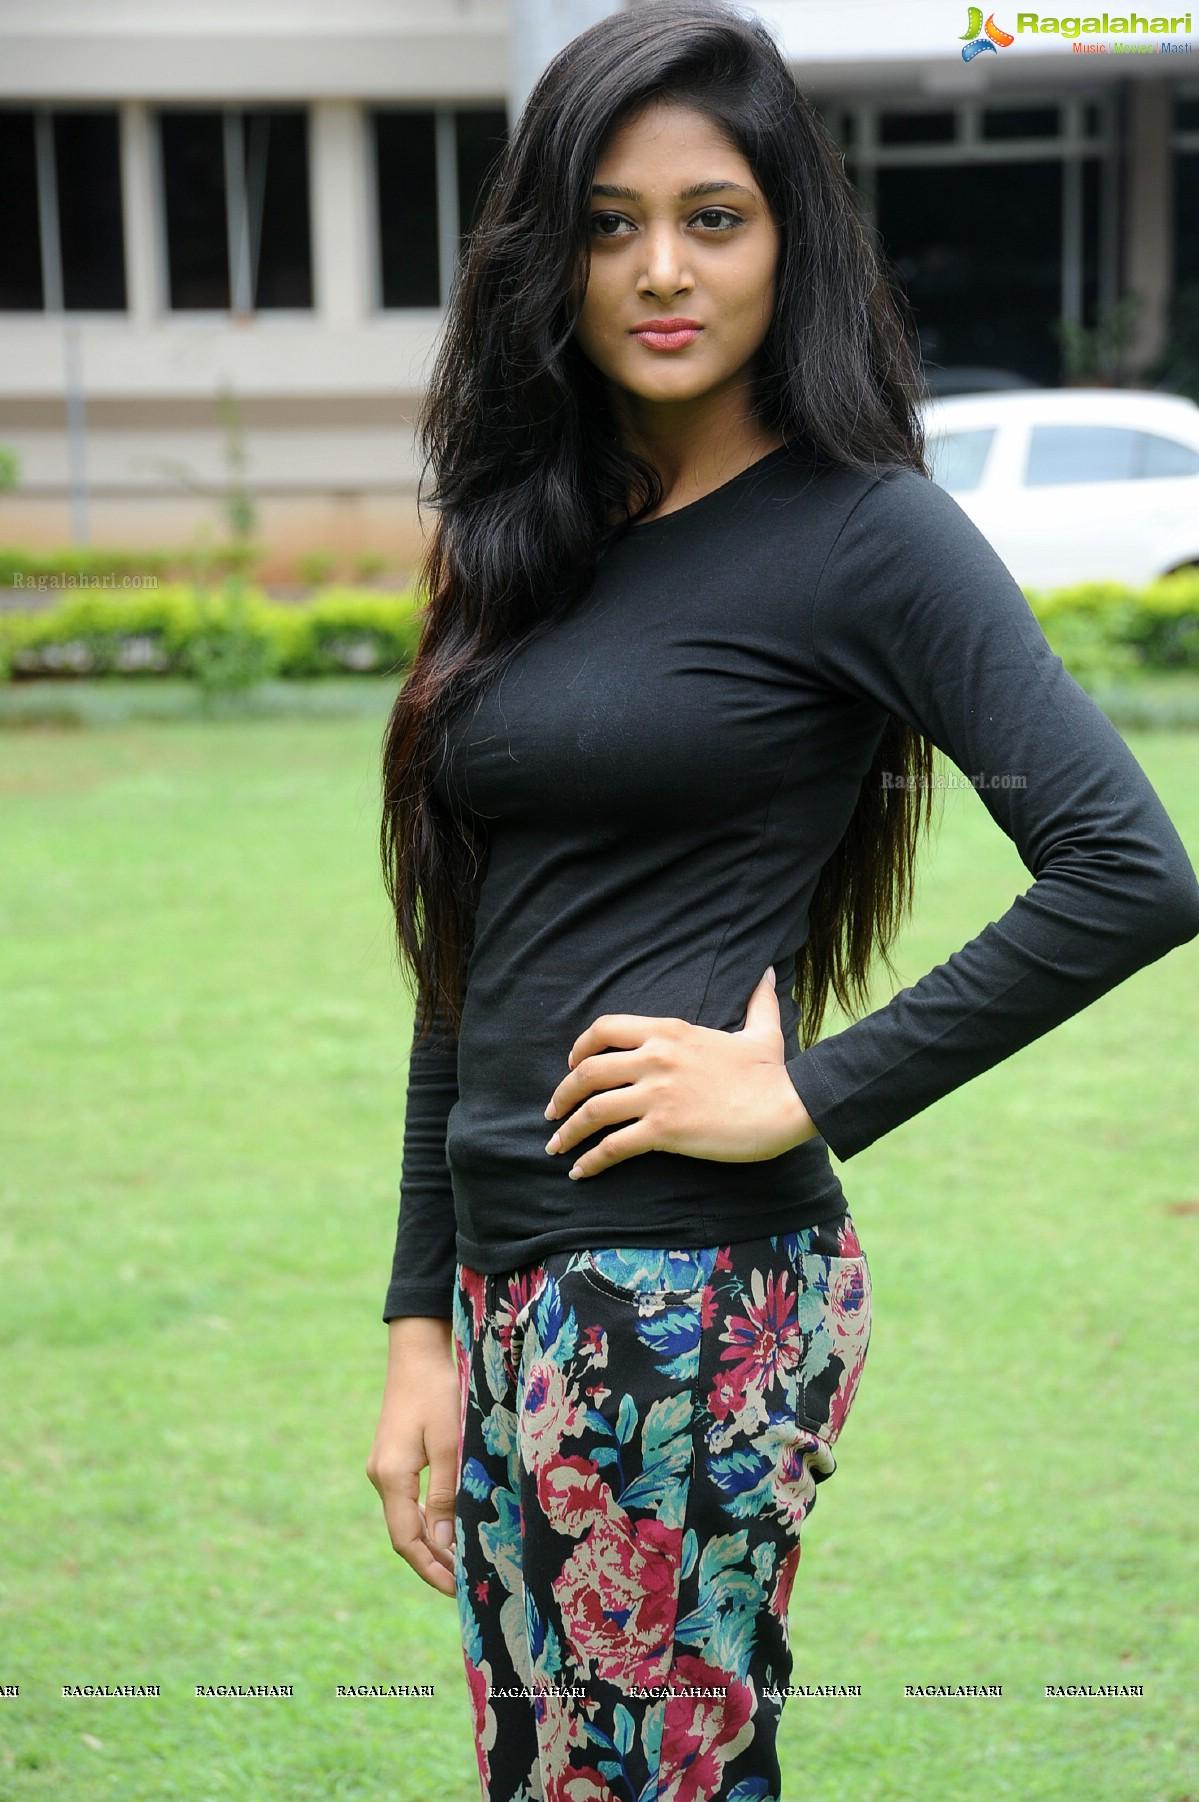 Sushma Raj Image 12 Telugu Cinema Heroines Photos Galleryimages